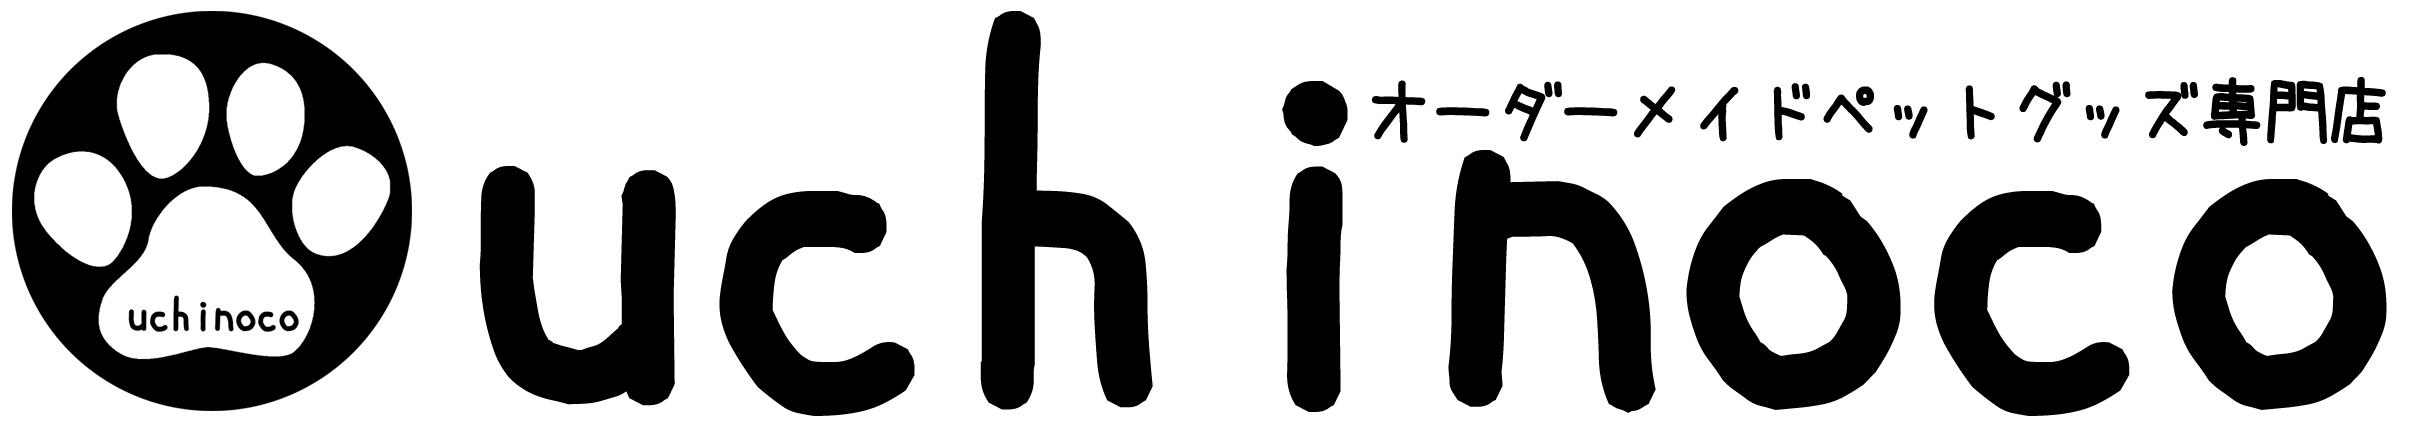 uchinoco オーダーメイドペットグッズ専門店